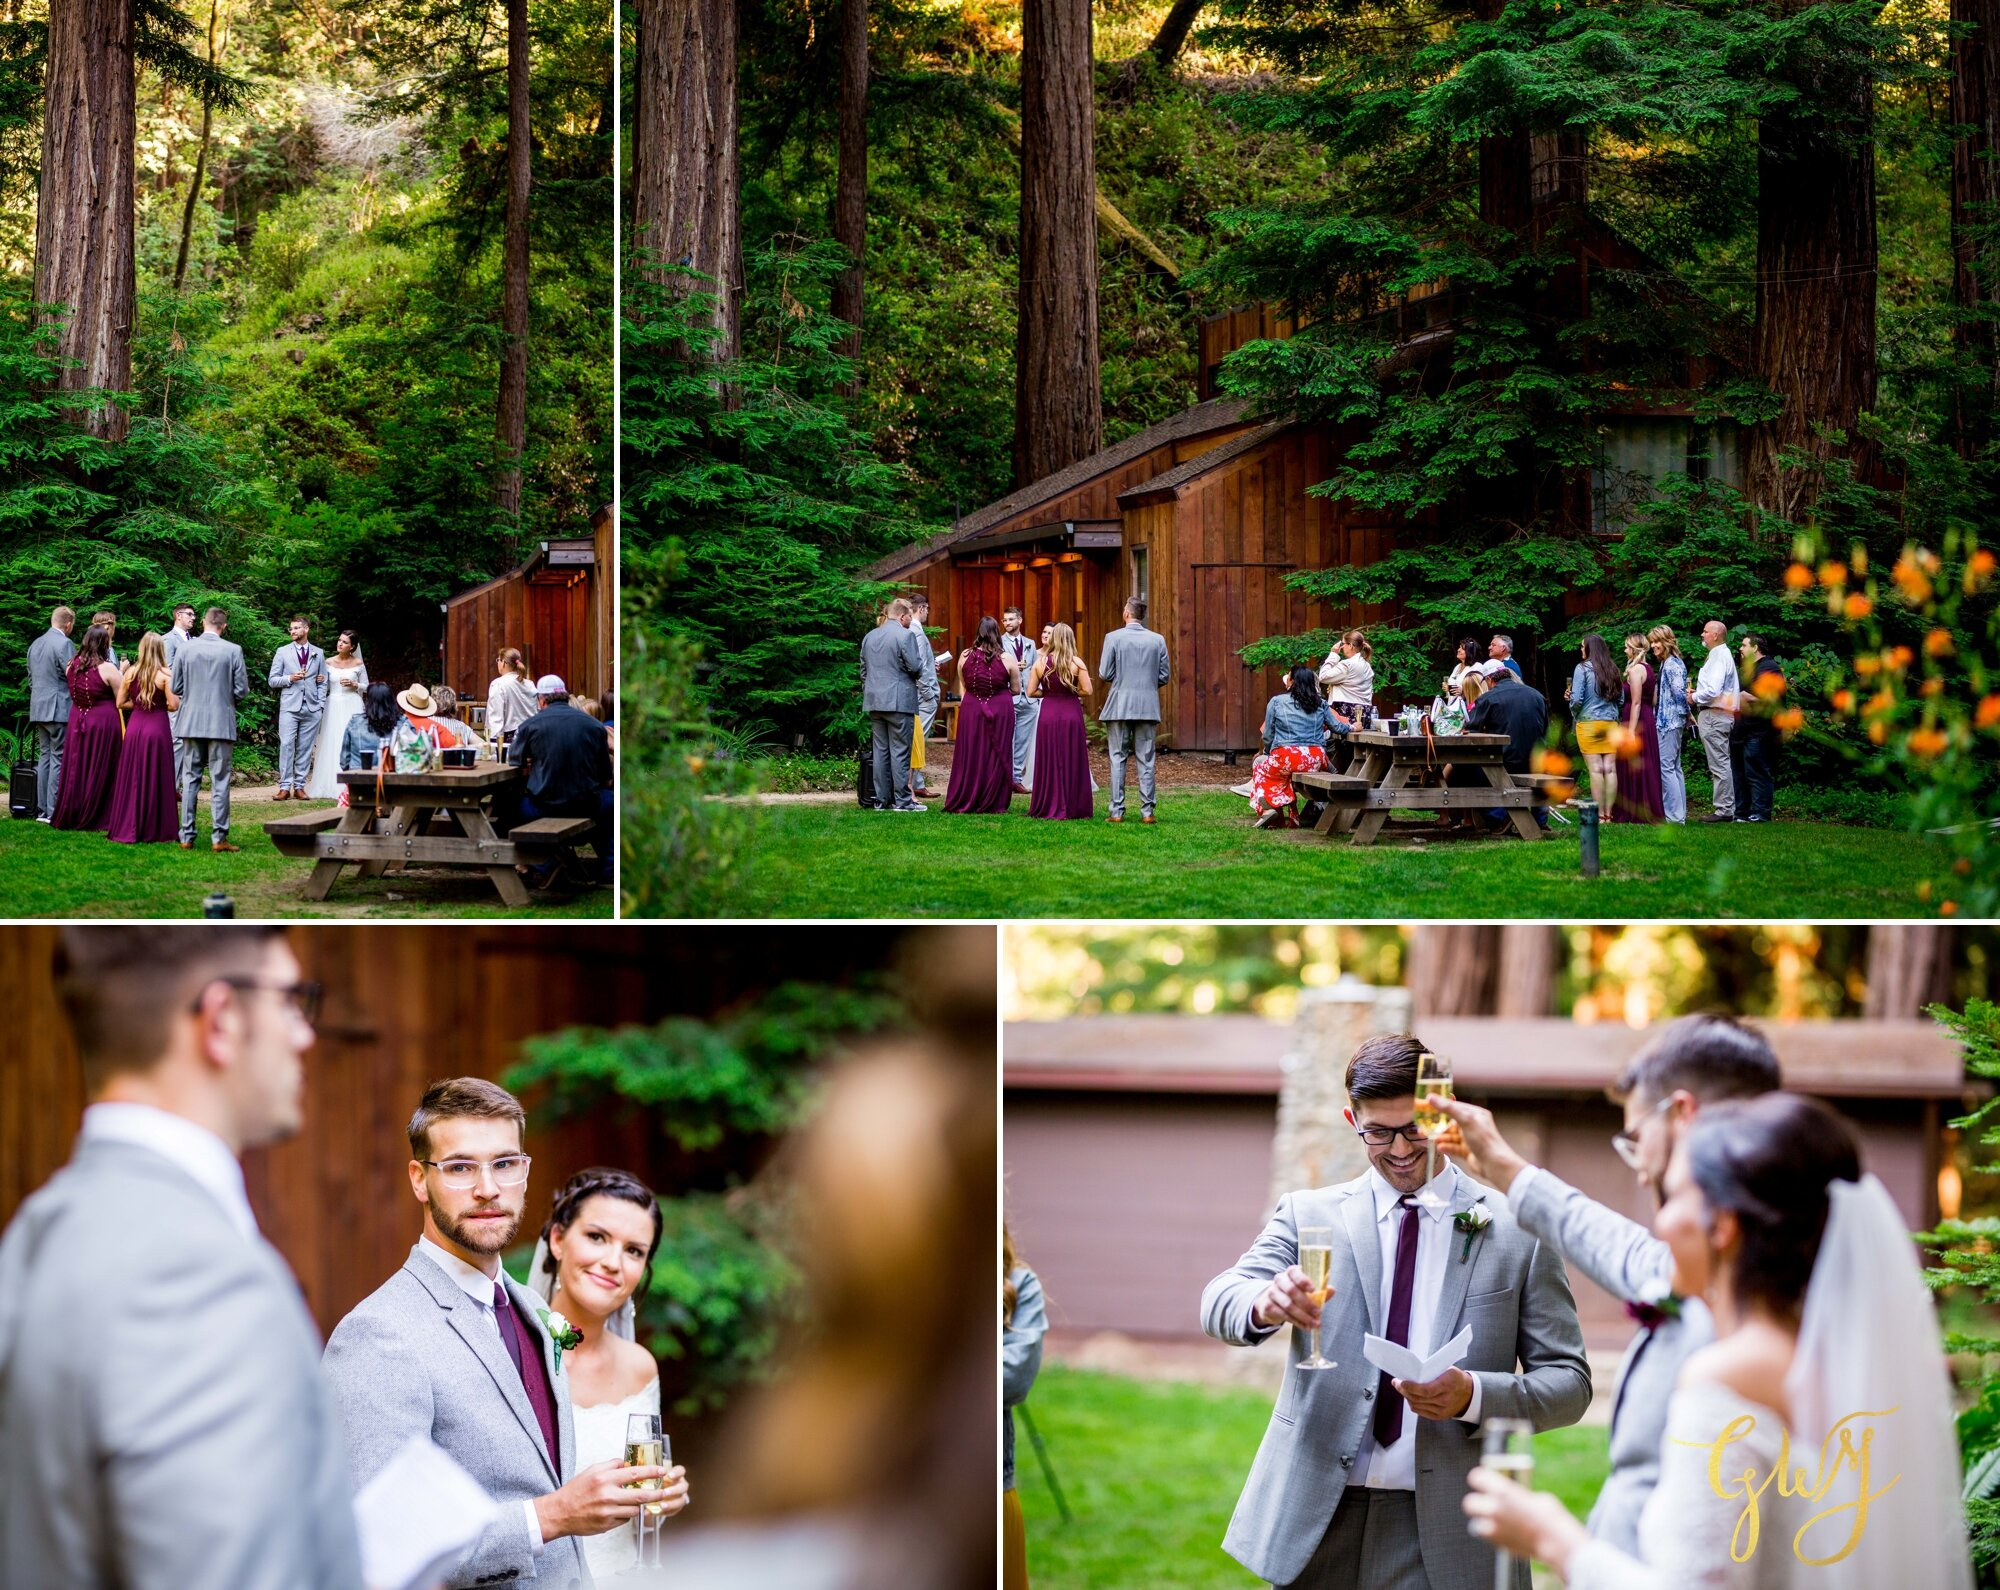 Casey + Jordan's Intimate Big Sur Elopement in the Redwoods by Glass Woods Media - 2 10.jpg